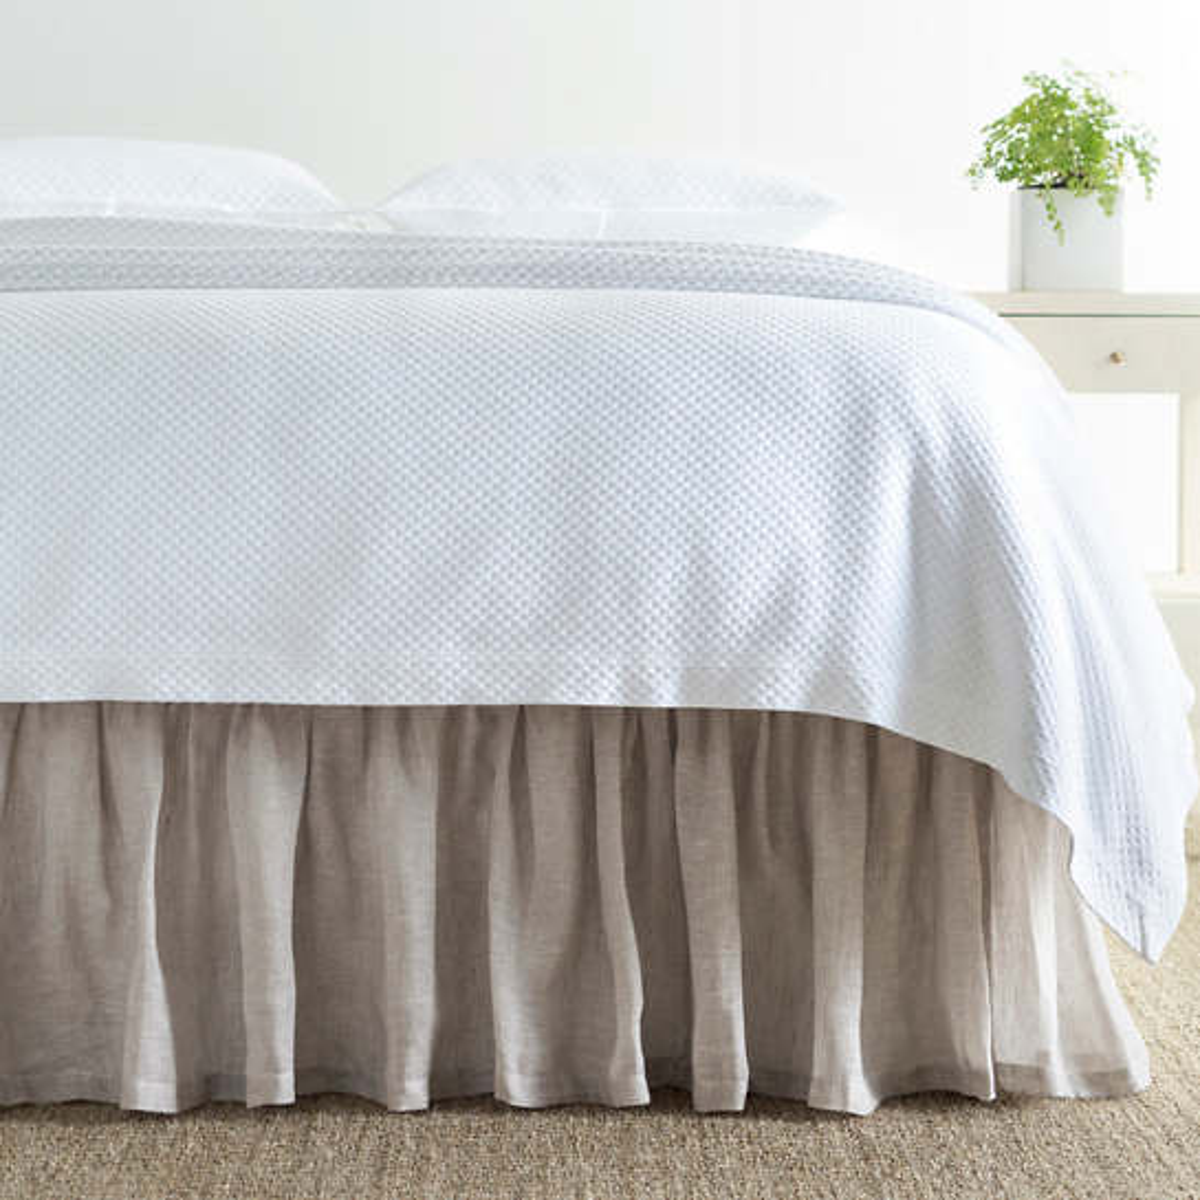 Savannah Linen Chambray Dove Grey Bed Skirt